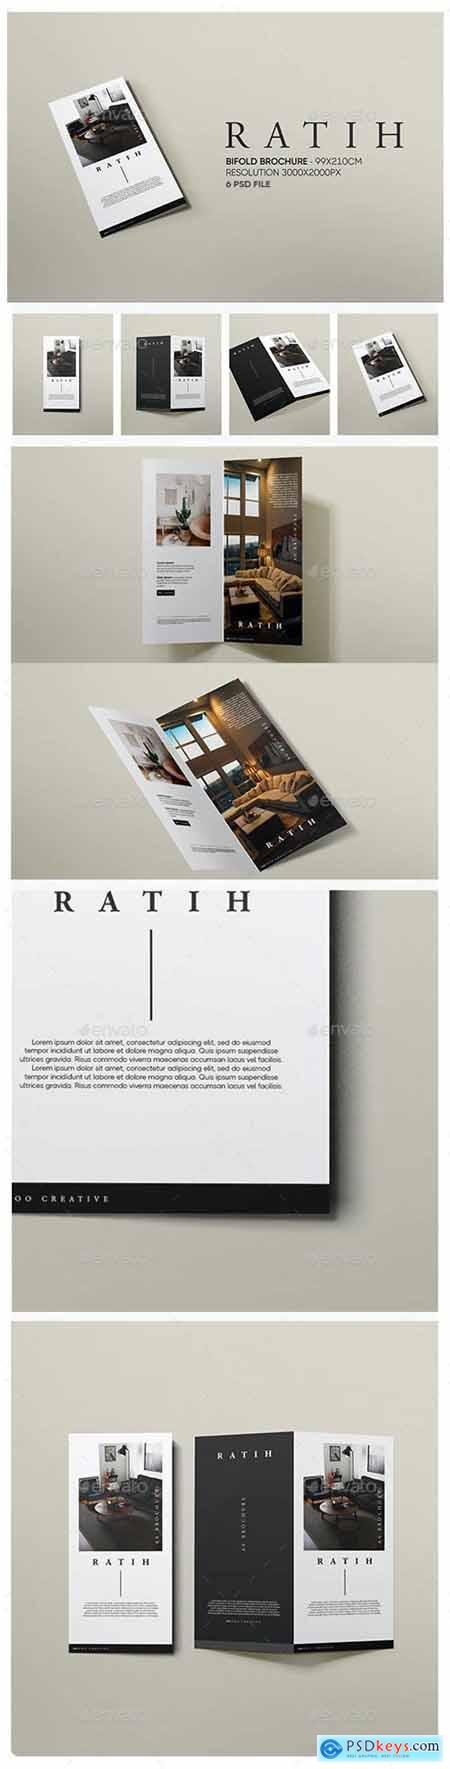 Ratih - DL Bifold Brochure Mockup - 29384754